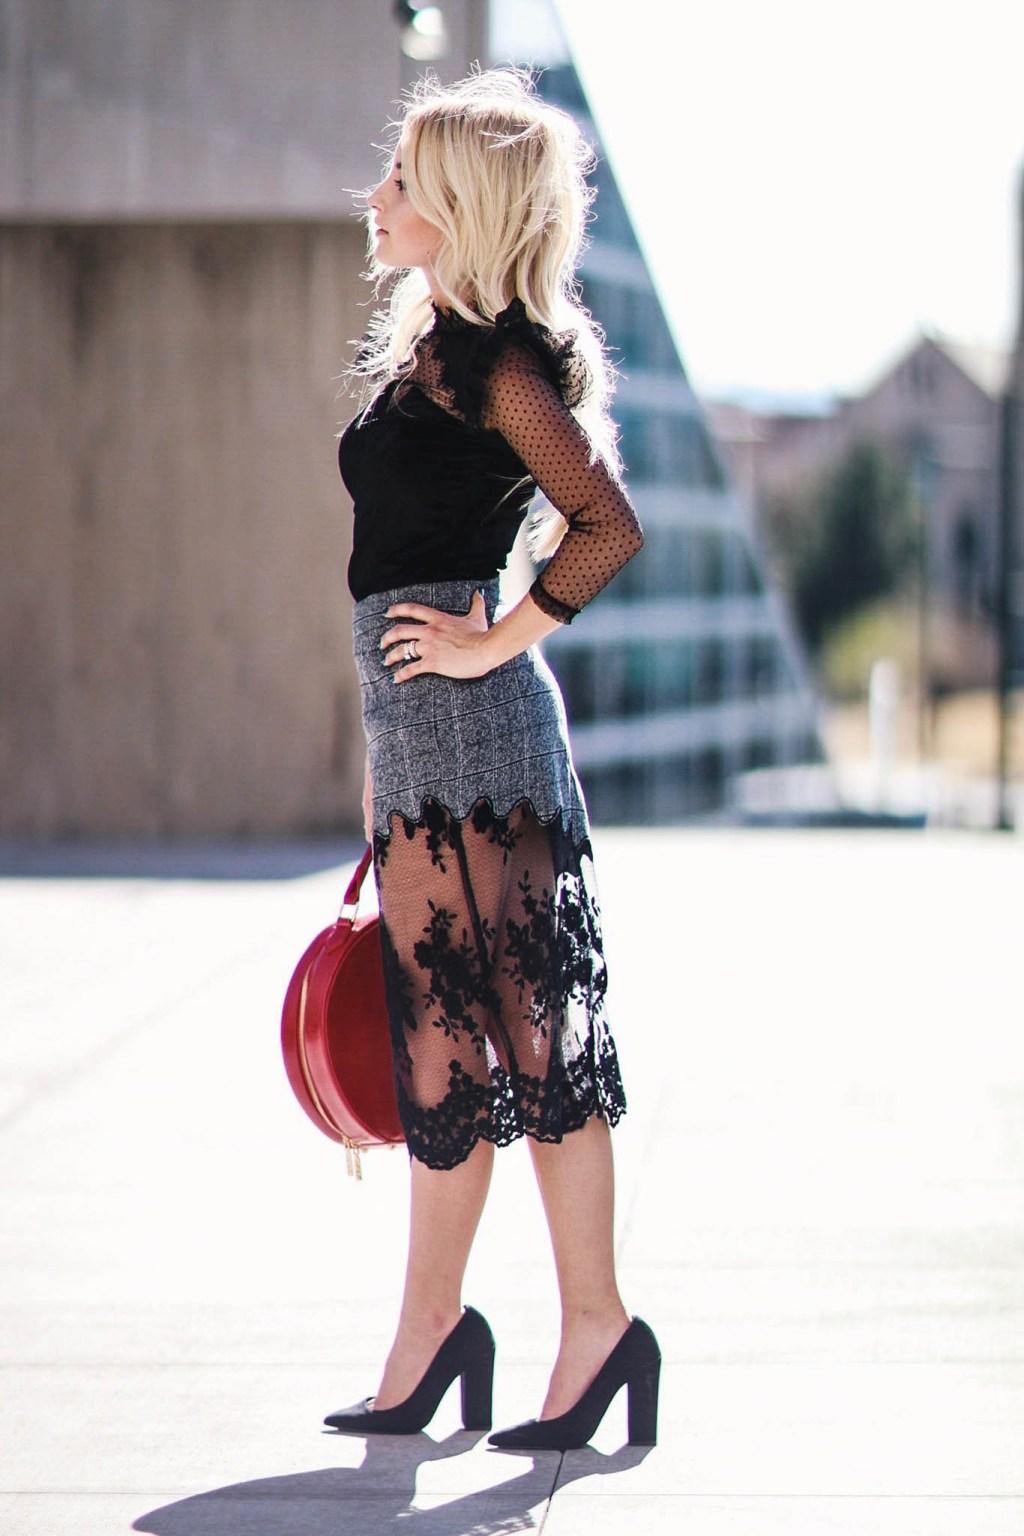 Alena Gidenko of modaprints.com styling a black sheer top with a grey pencil skirt